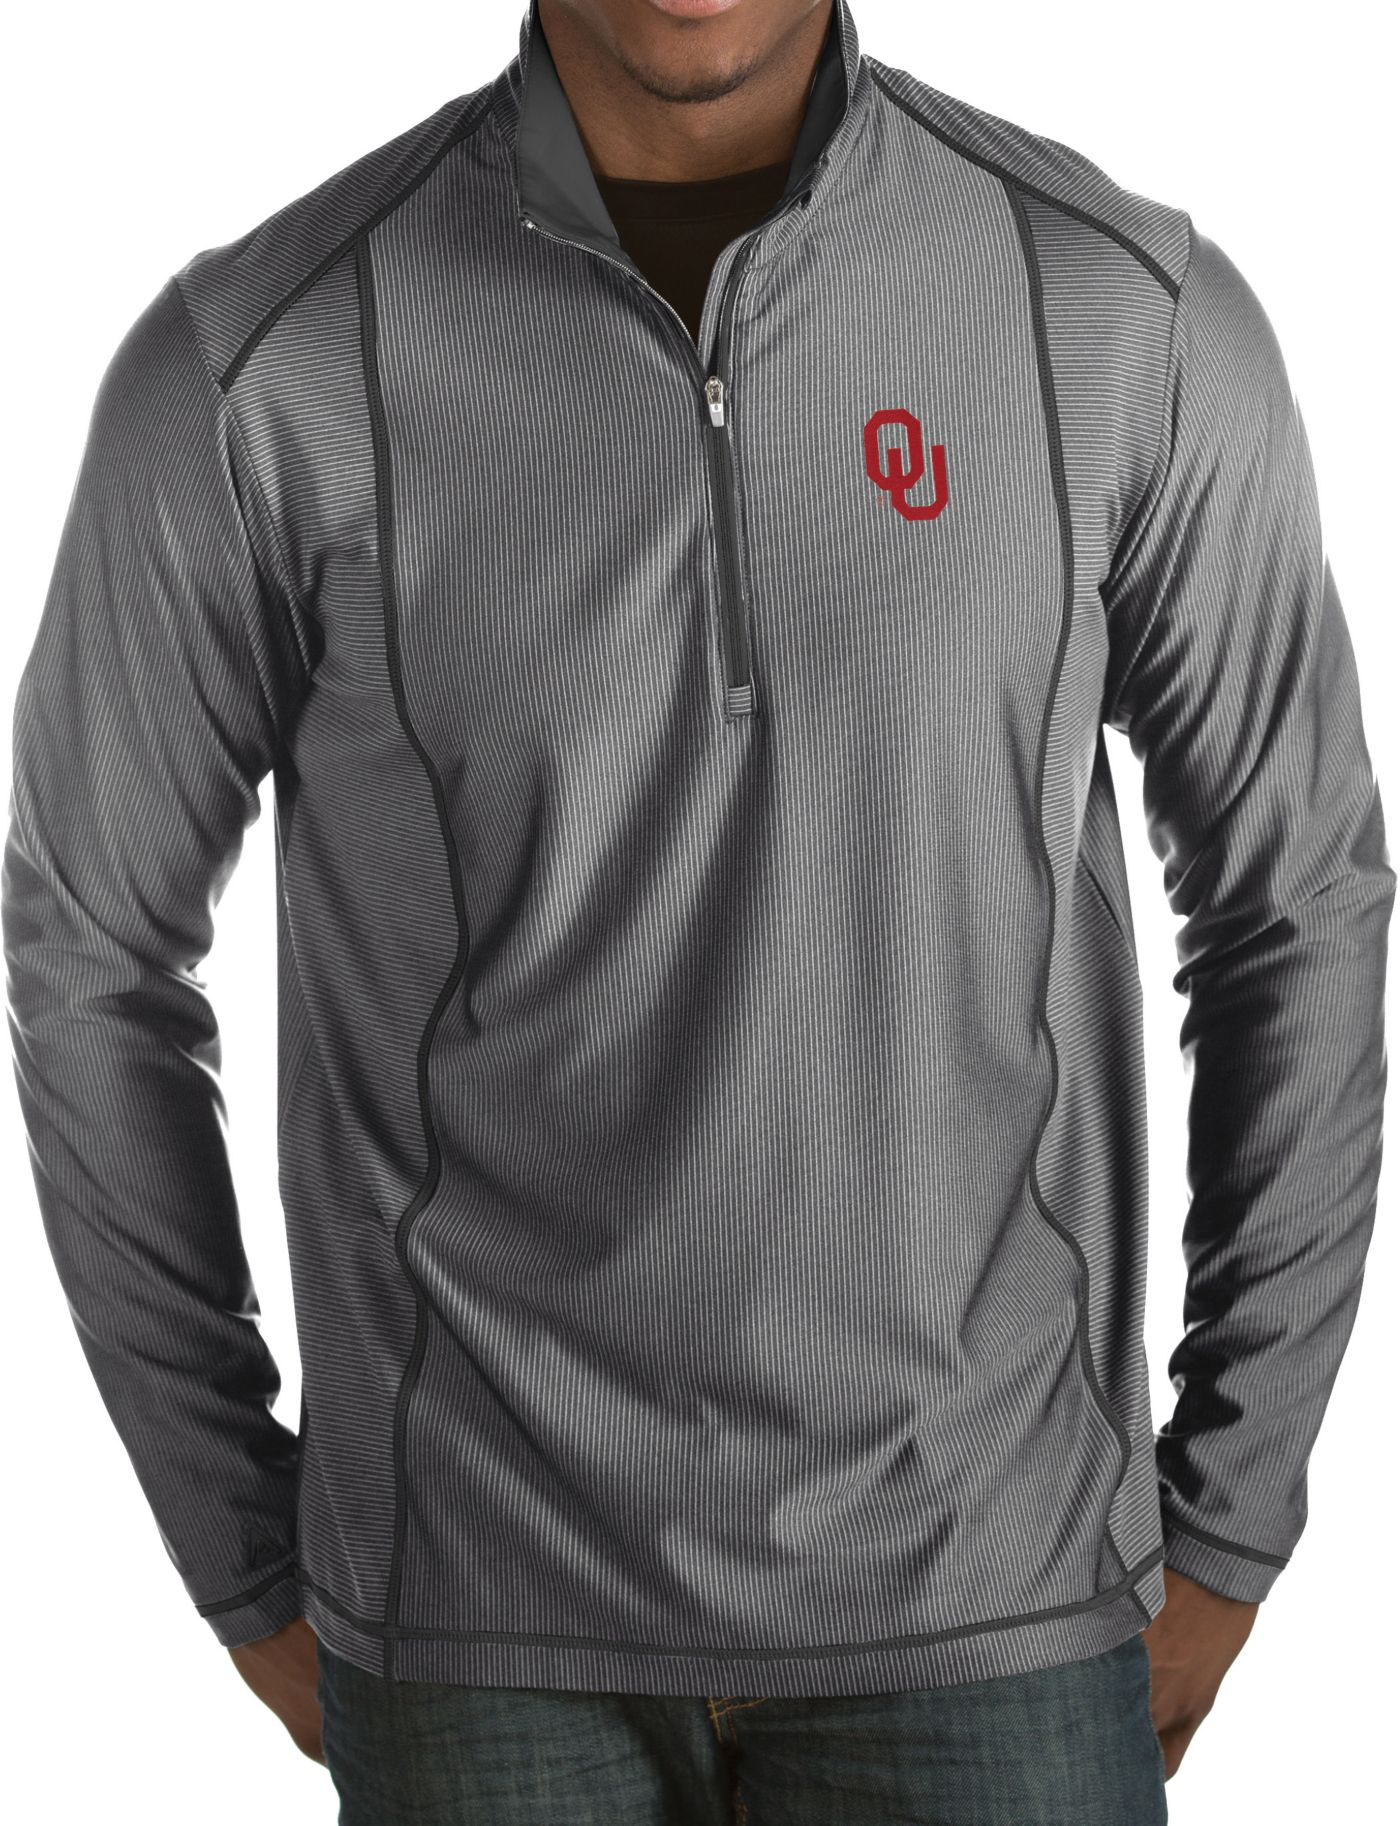 Antigua Men's Oklahoma Sooners Grey Tempo Half-Zip Pullover